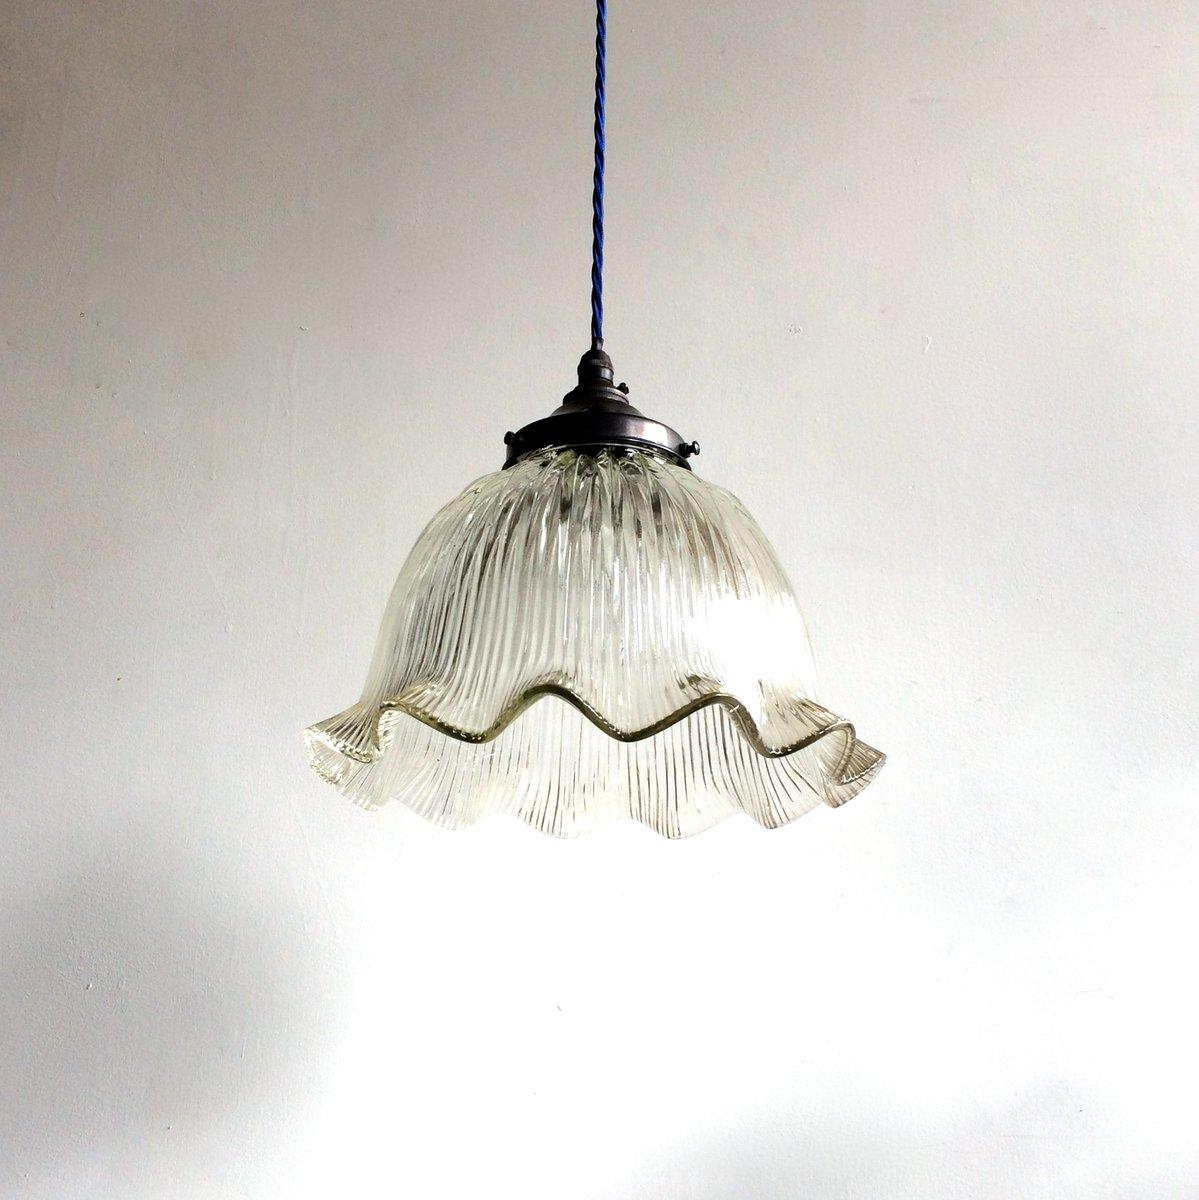 vintage glas h ngelampe von holophane bei pamono kaufen. Black Bedroom Furniture Sets. Home Design Ideas